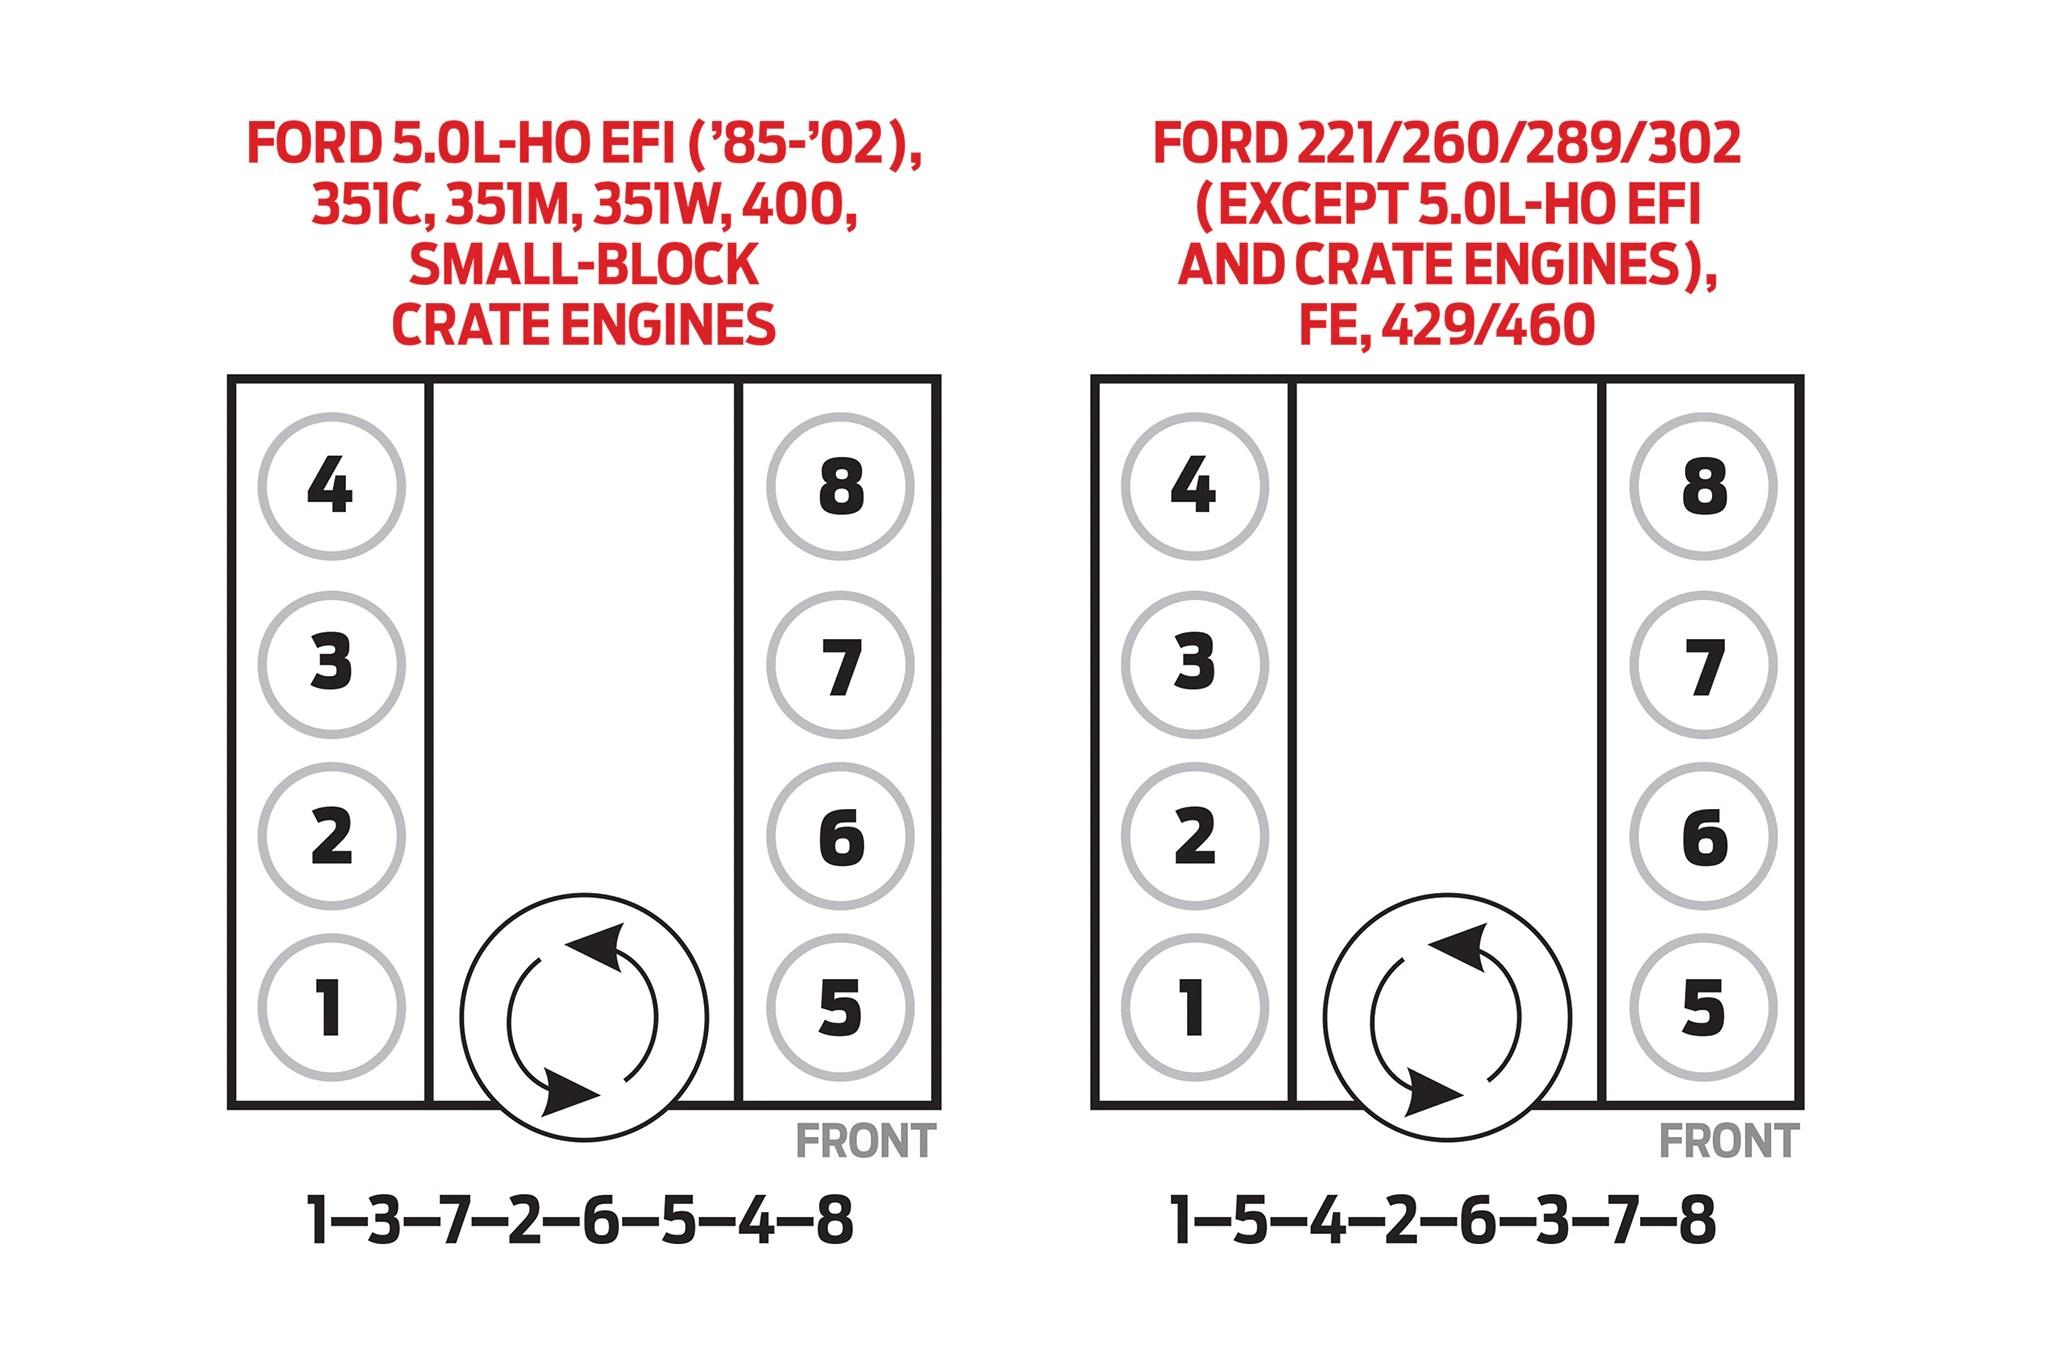 medium resolution of ford f 150 4 2 v6 engine diagram wiring library ford 289 firing order diagram on 2006 ford f 150 5 4 firing order